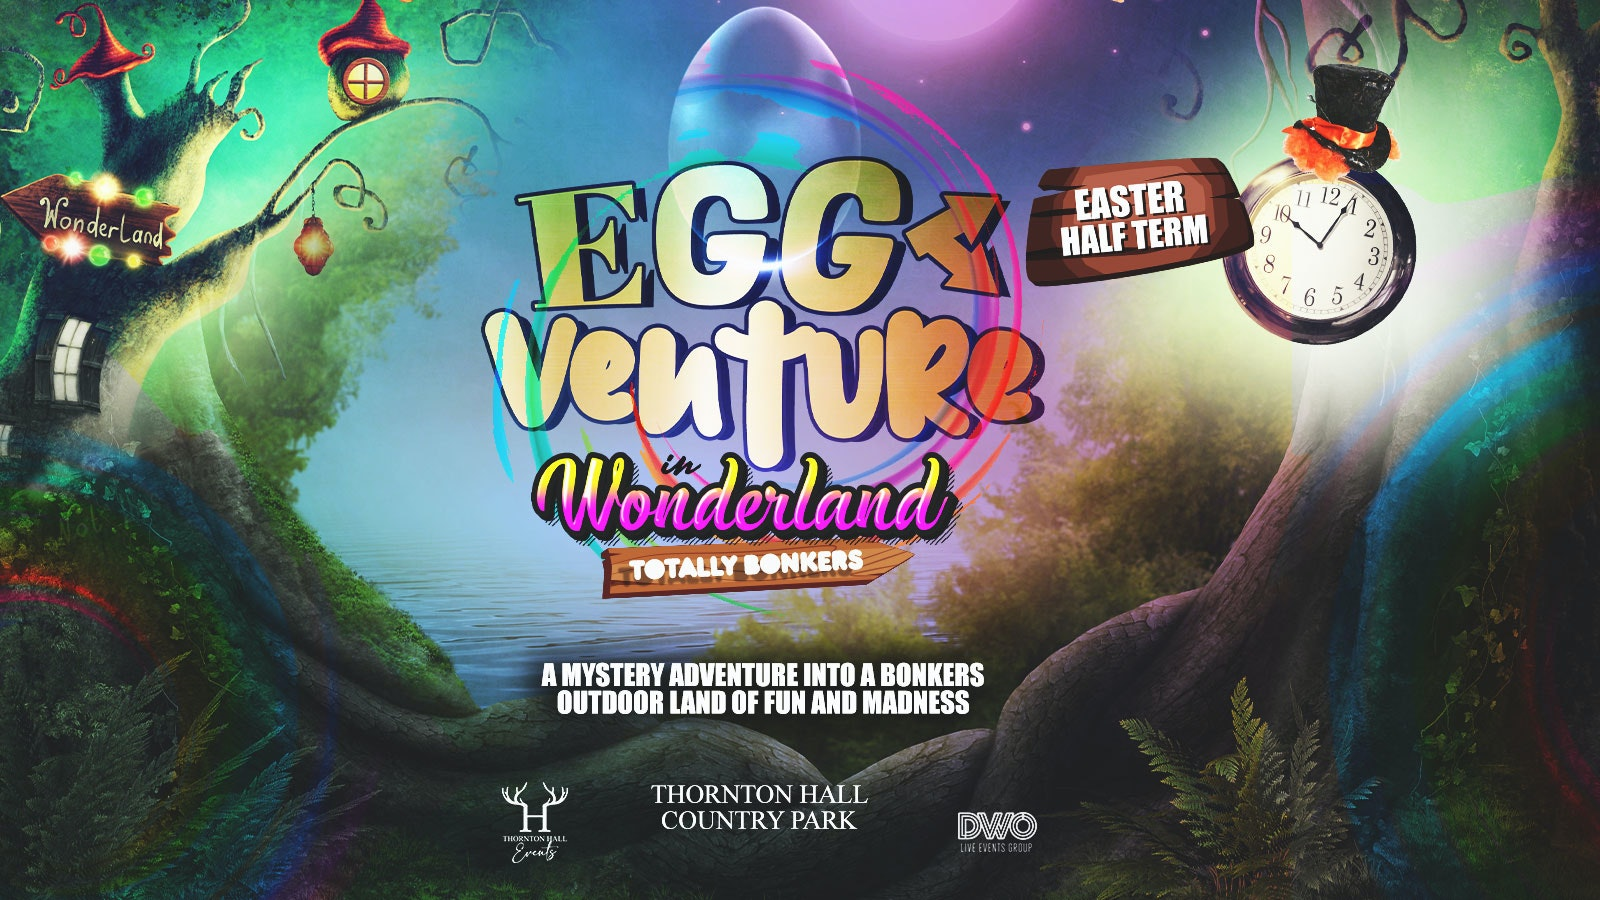 EggVenture in Wonderland –  Friday 9th April – 10.30am